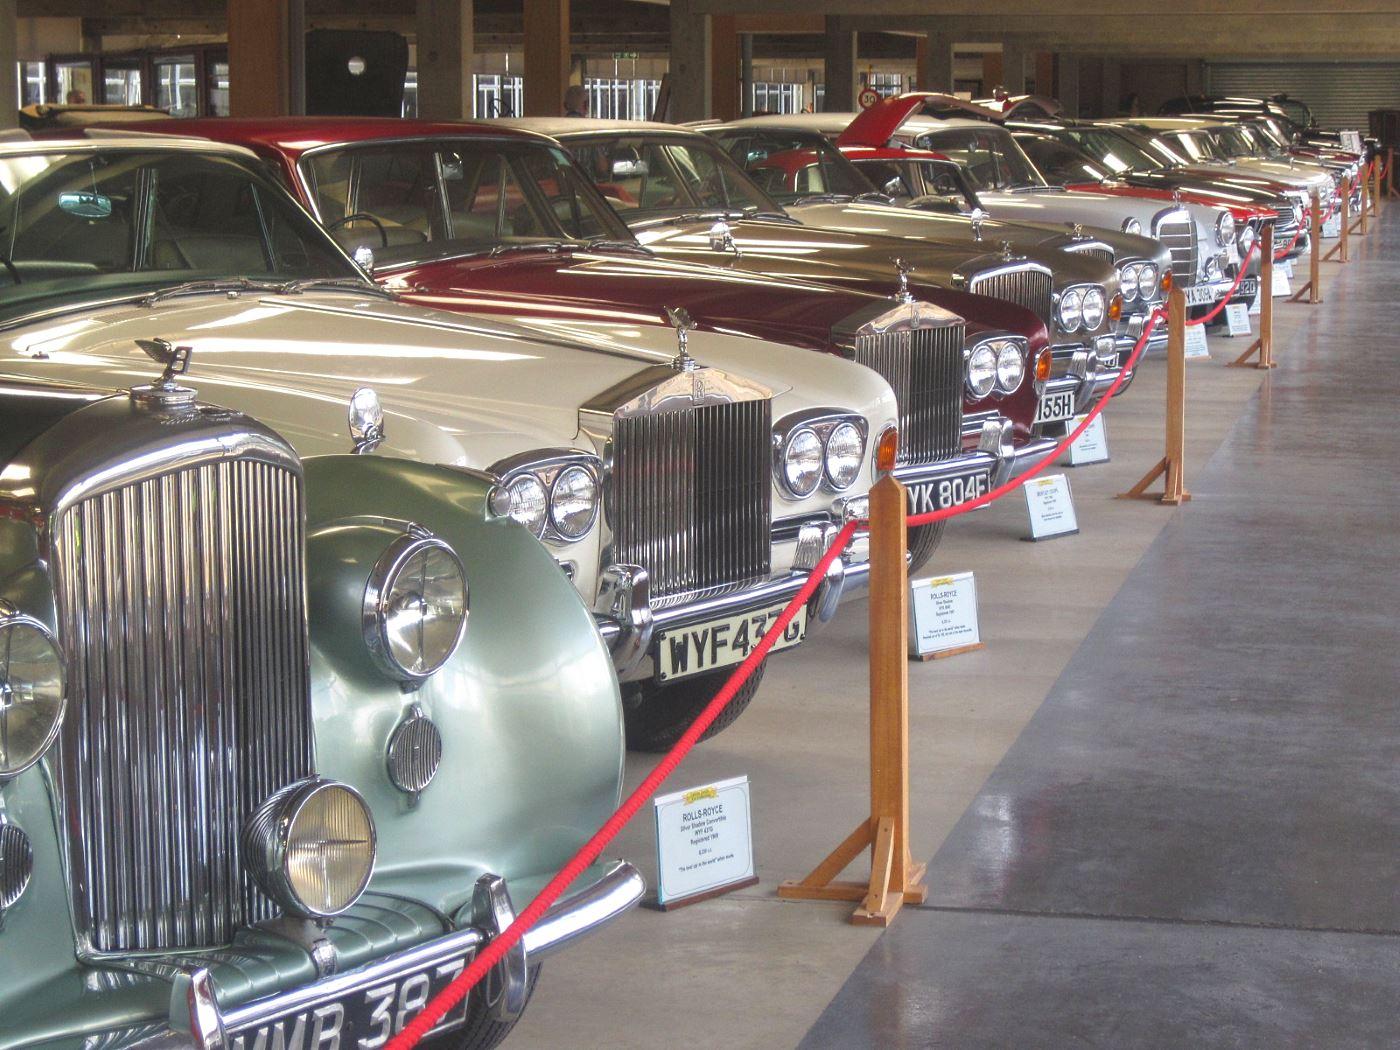 caister castle cars5 - Credit D Bardsley